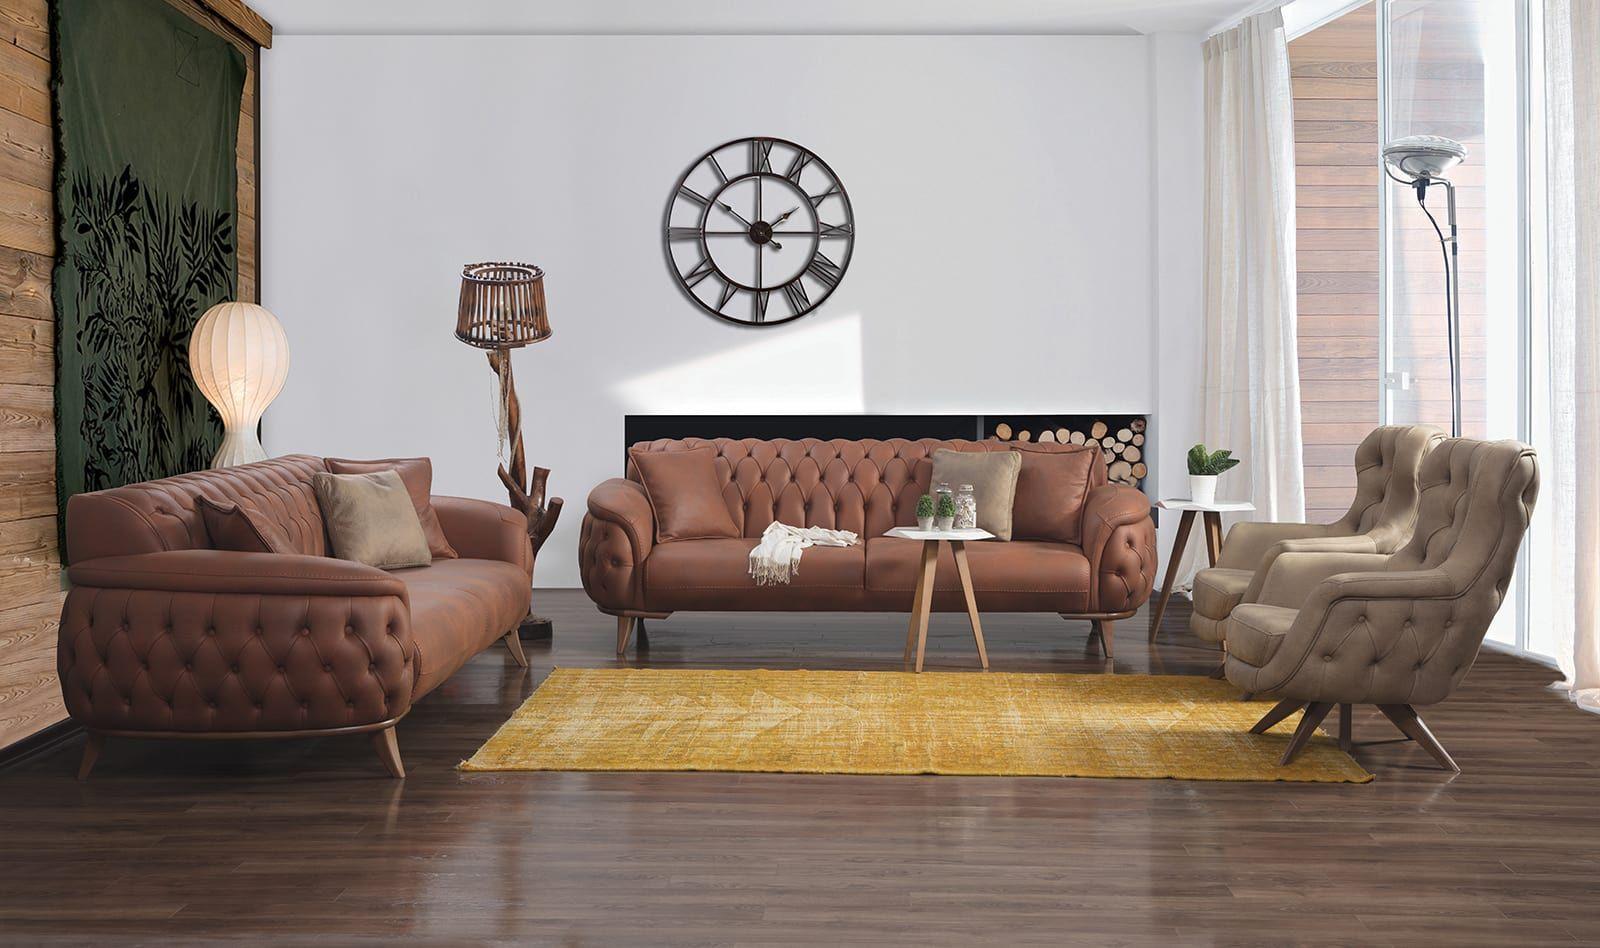 Bugatti Koltuk Takimi Chester Koltuk Takimlari Oturma Odasi Takimlari Oturma Odasi Fikirleri Oturma Odasi Dekorasyonu